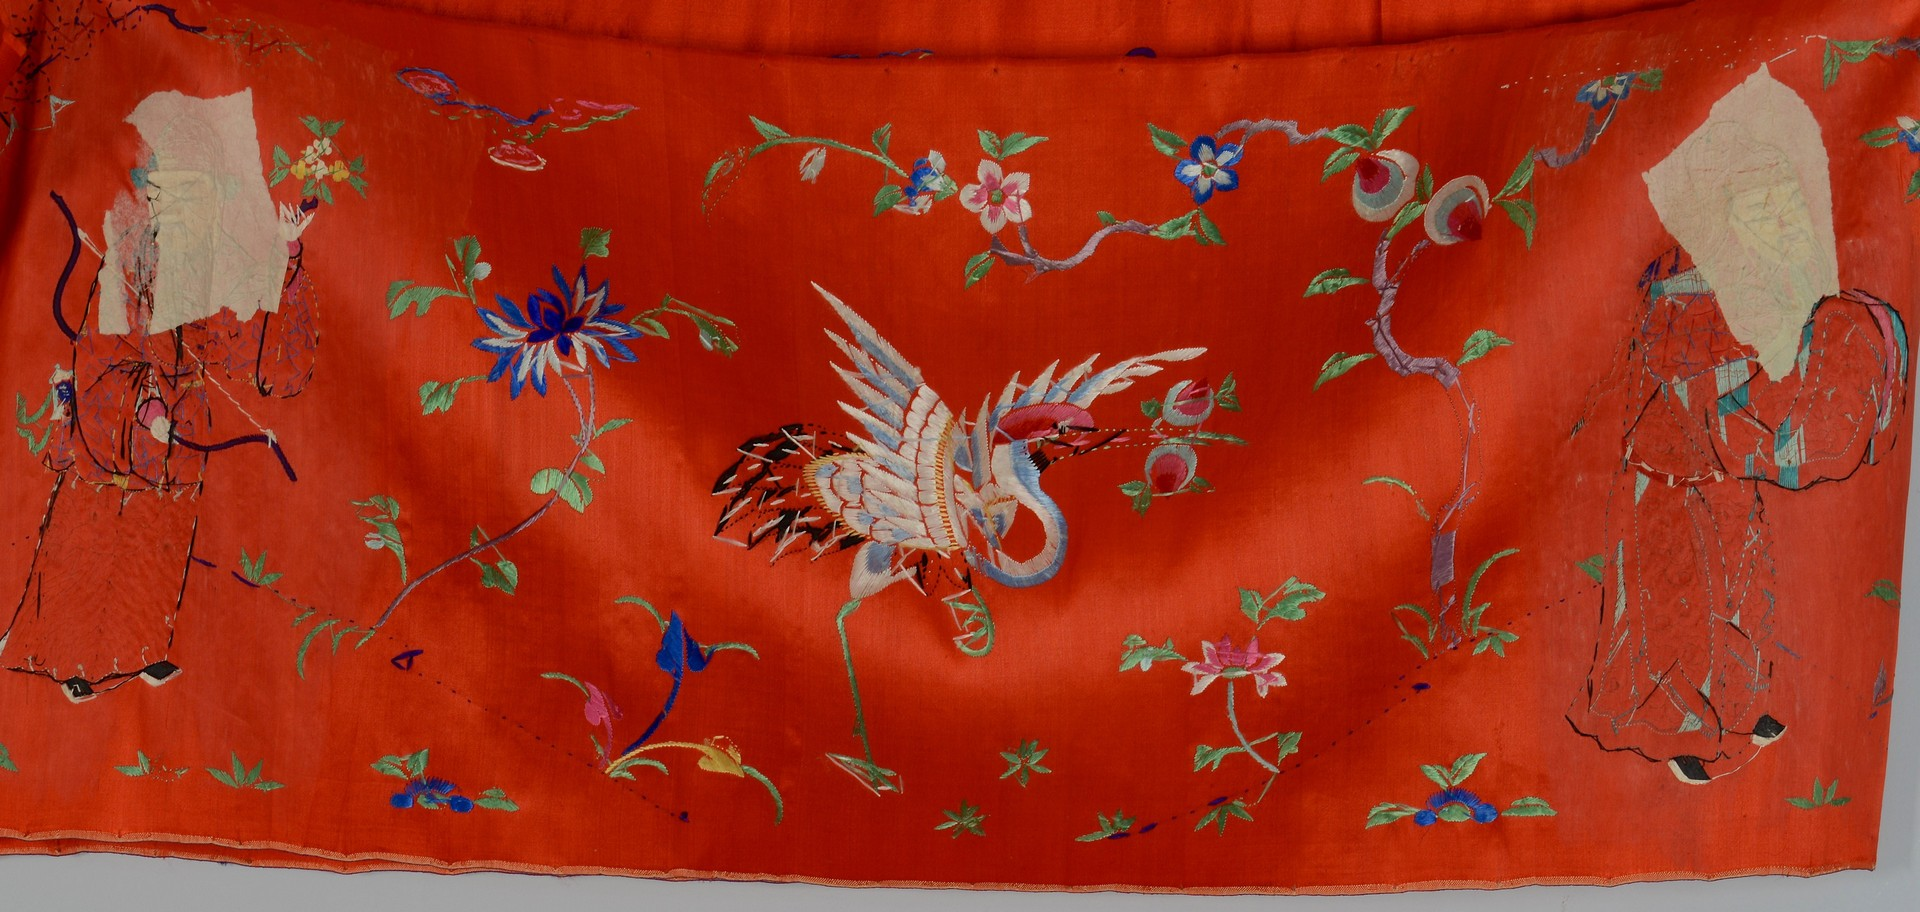 Lot 3383211: 2 Asian Silk Scrolls